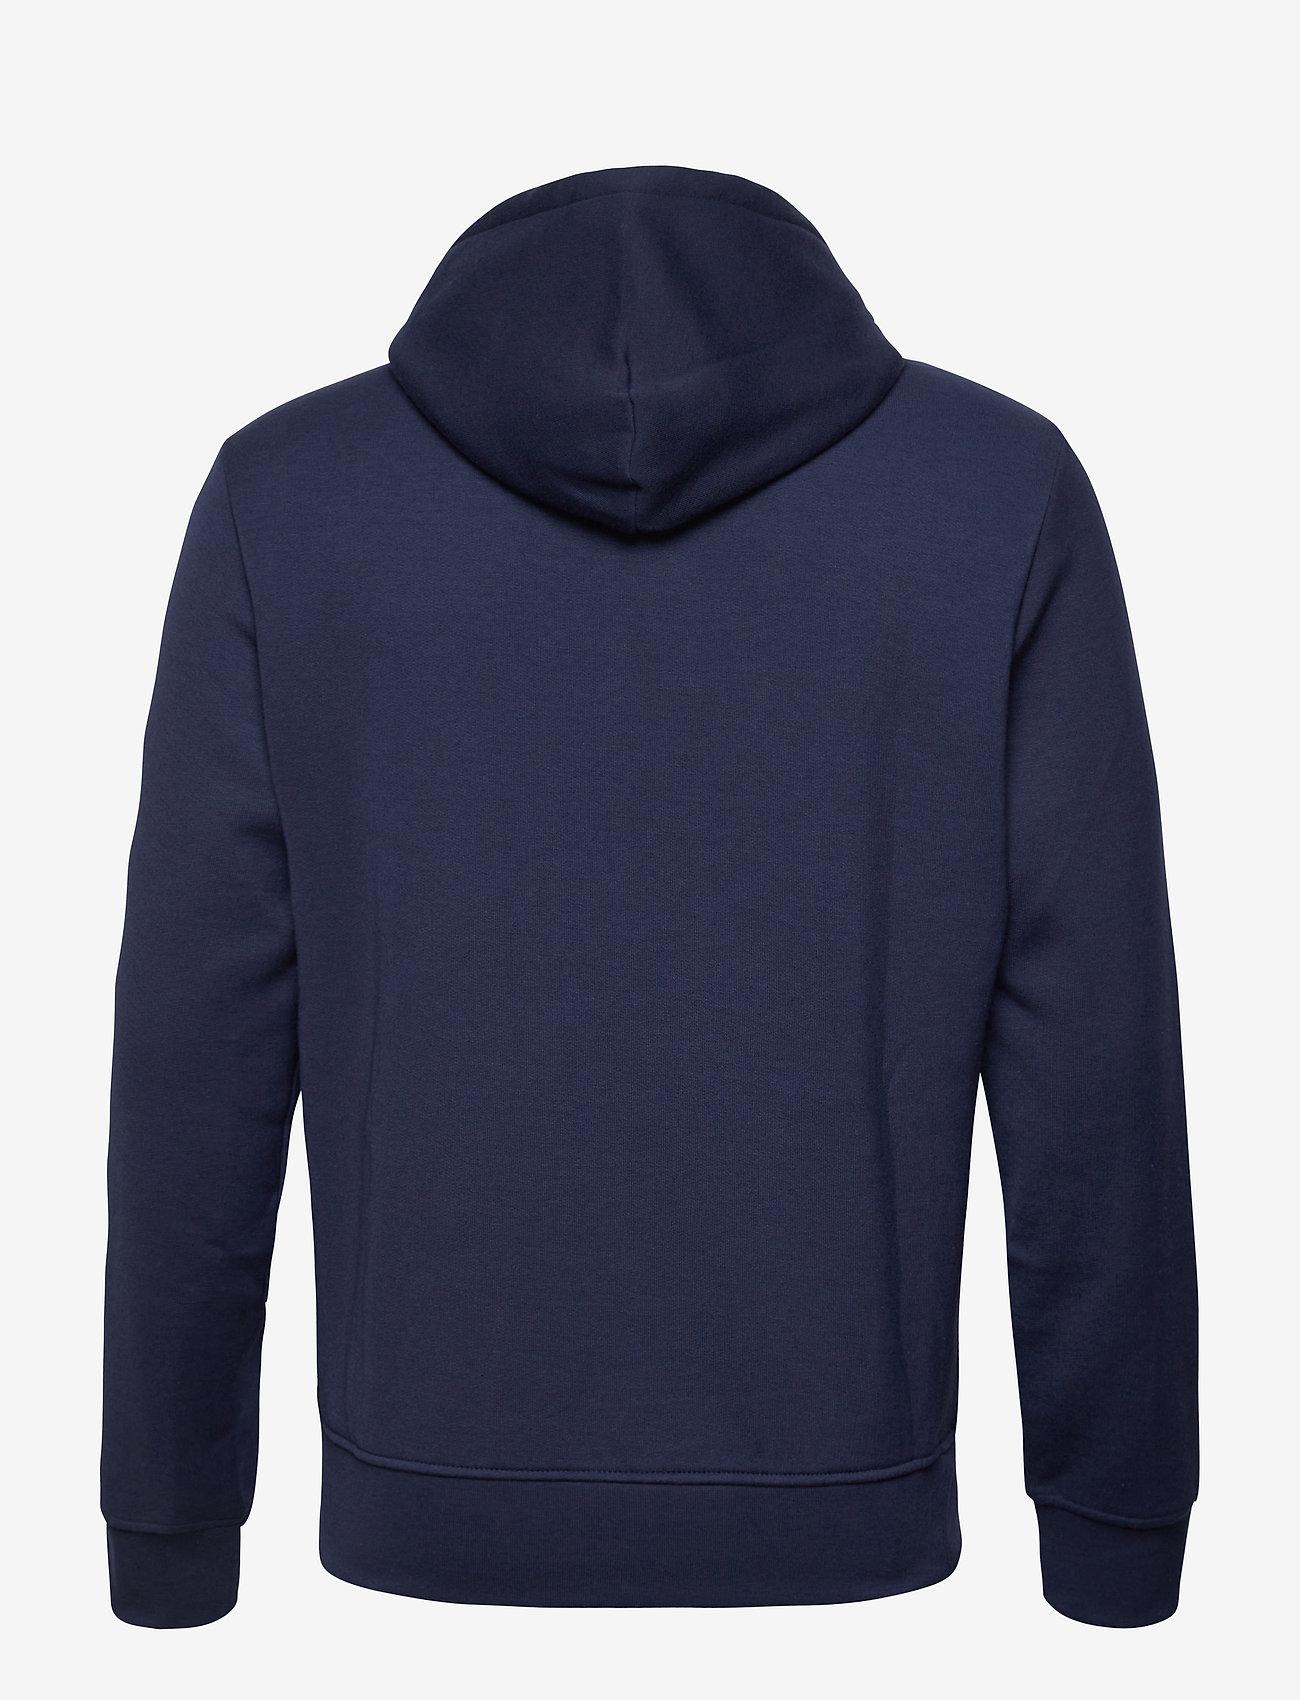 Polo Ralph Lauren - NEON FLEECE-LSL-KNT - basic sweatshirts - cruise navy - 1